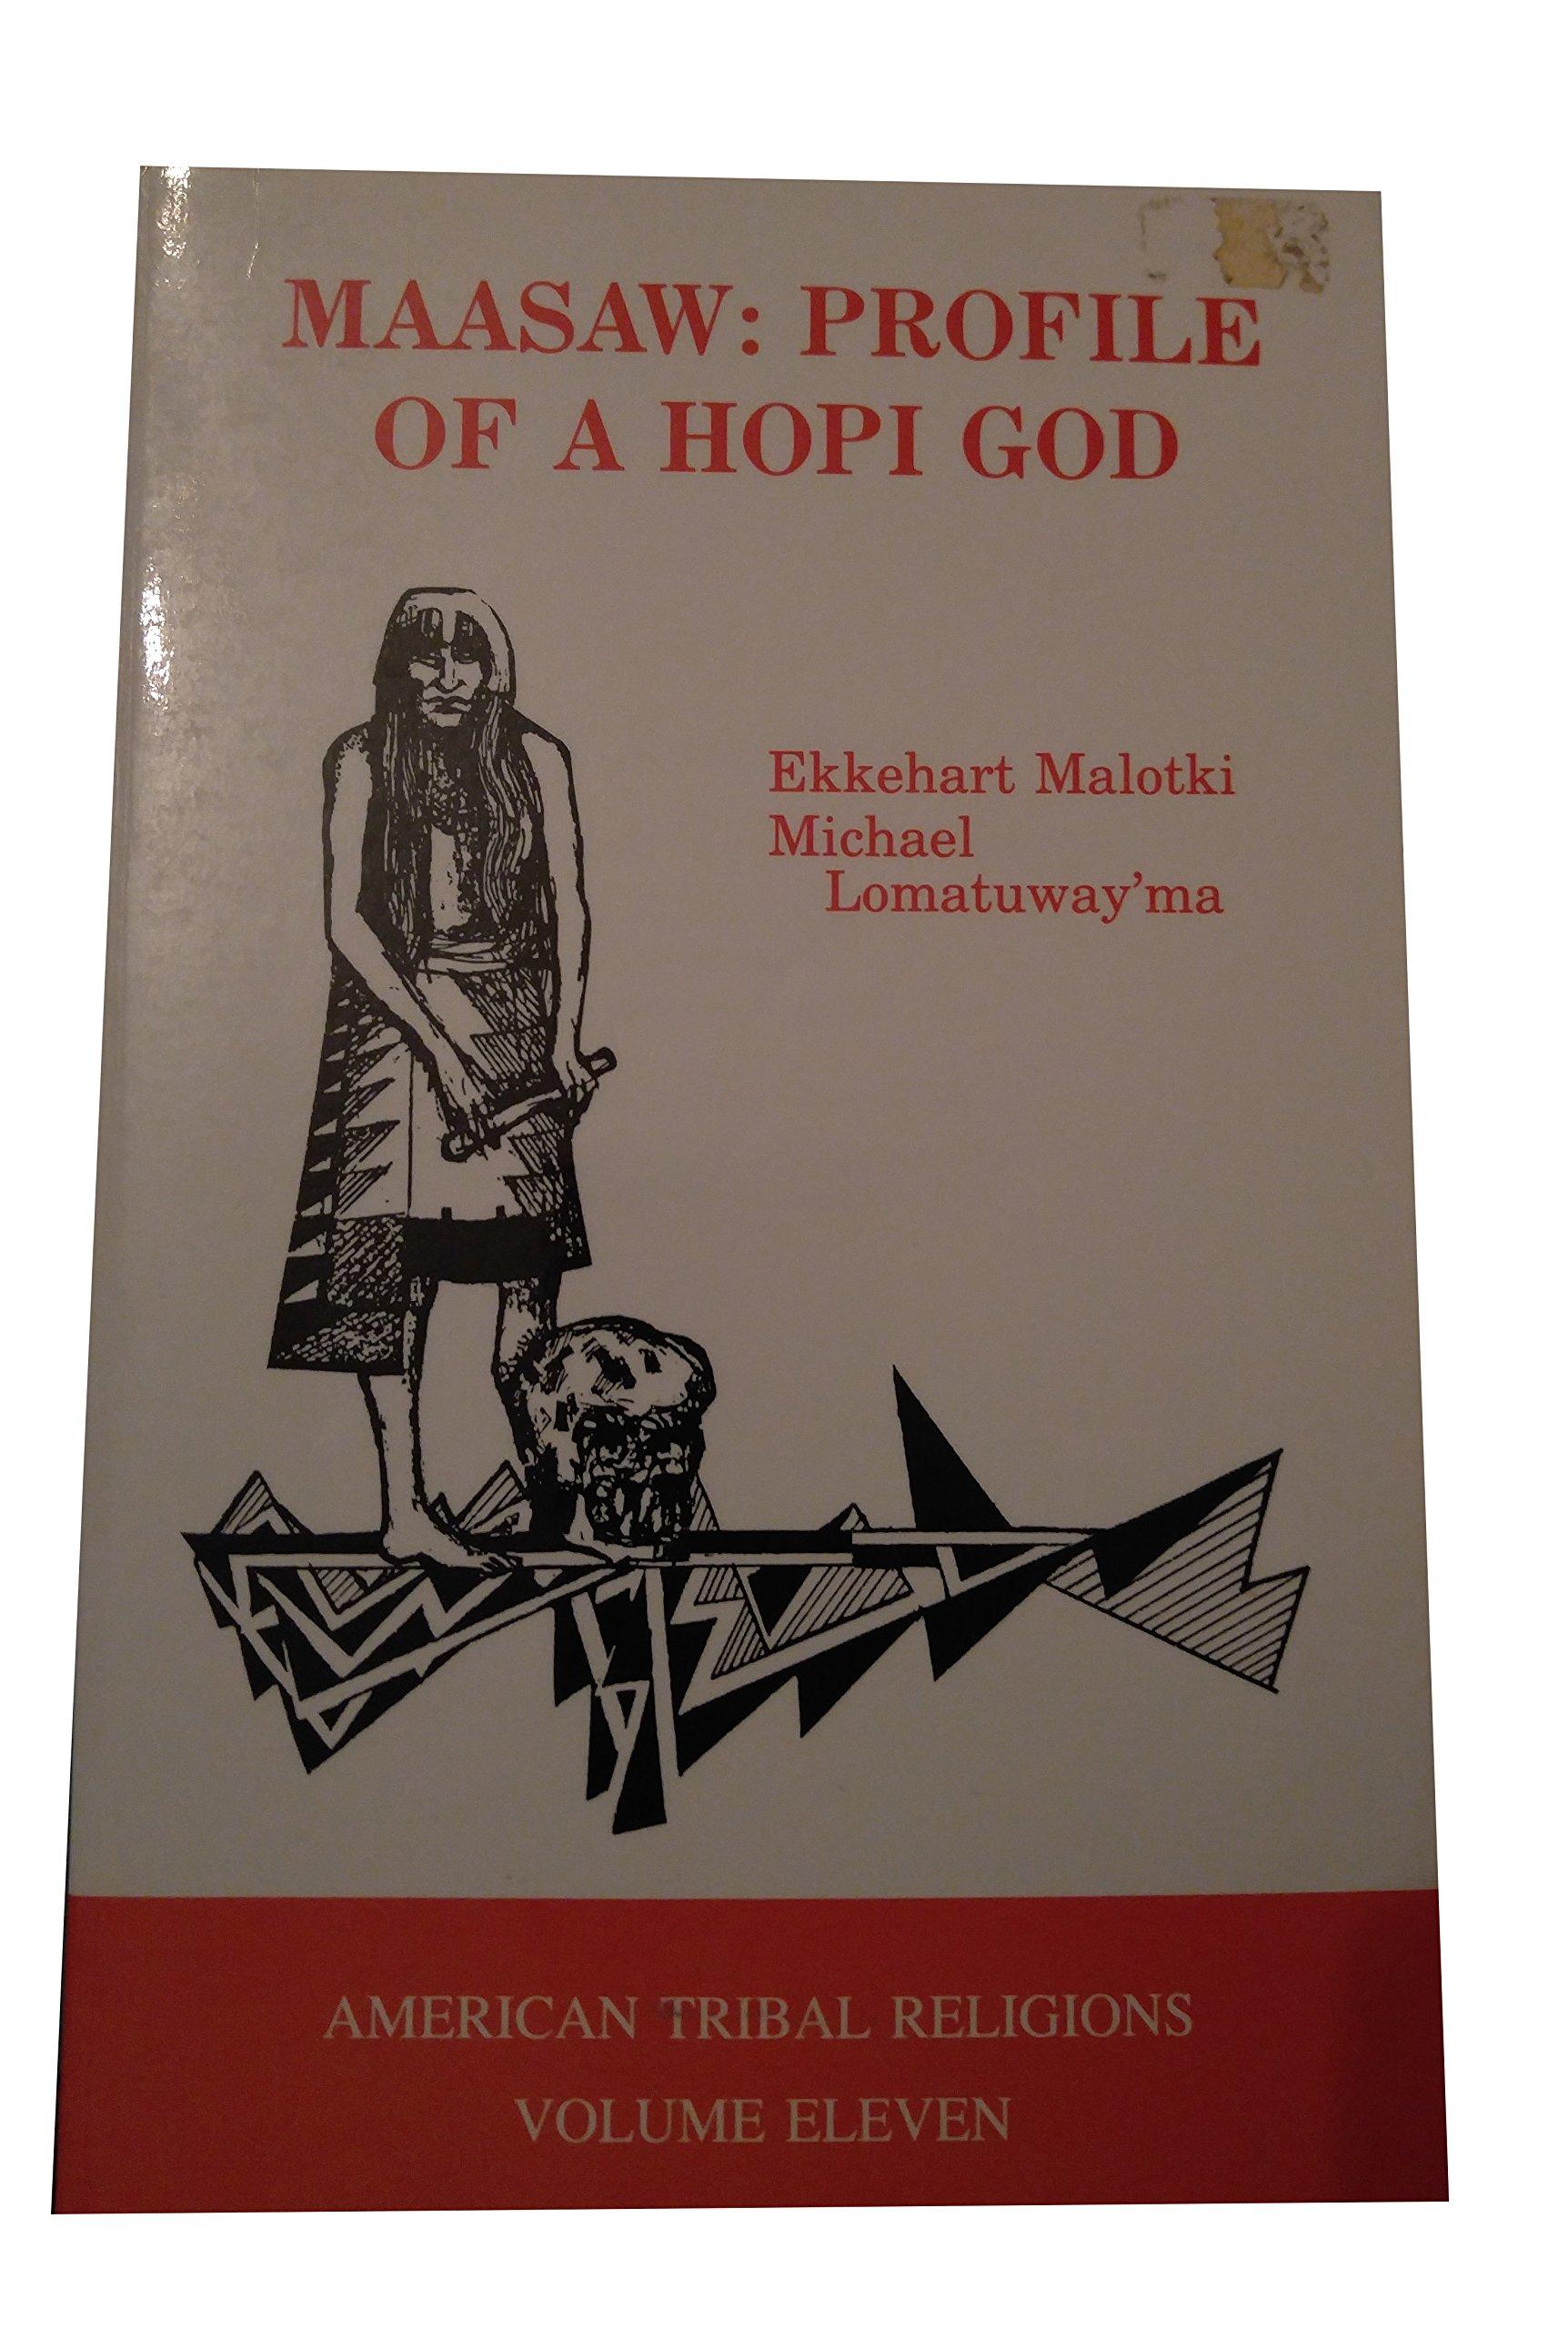 Maasaw: Profile of a Hopi God (American Tribal Religions)